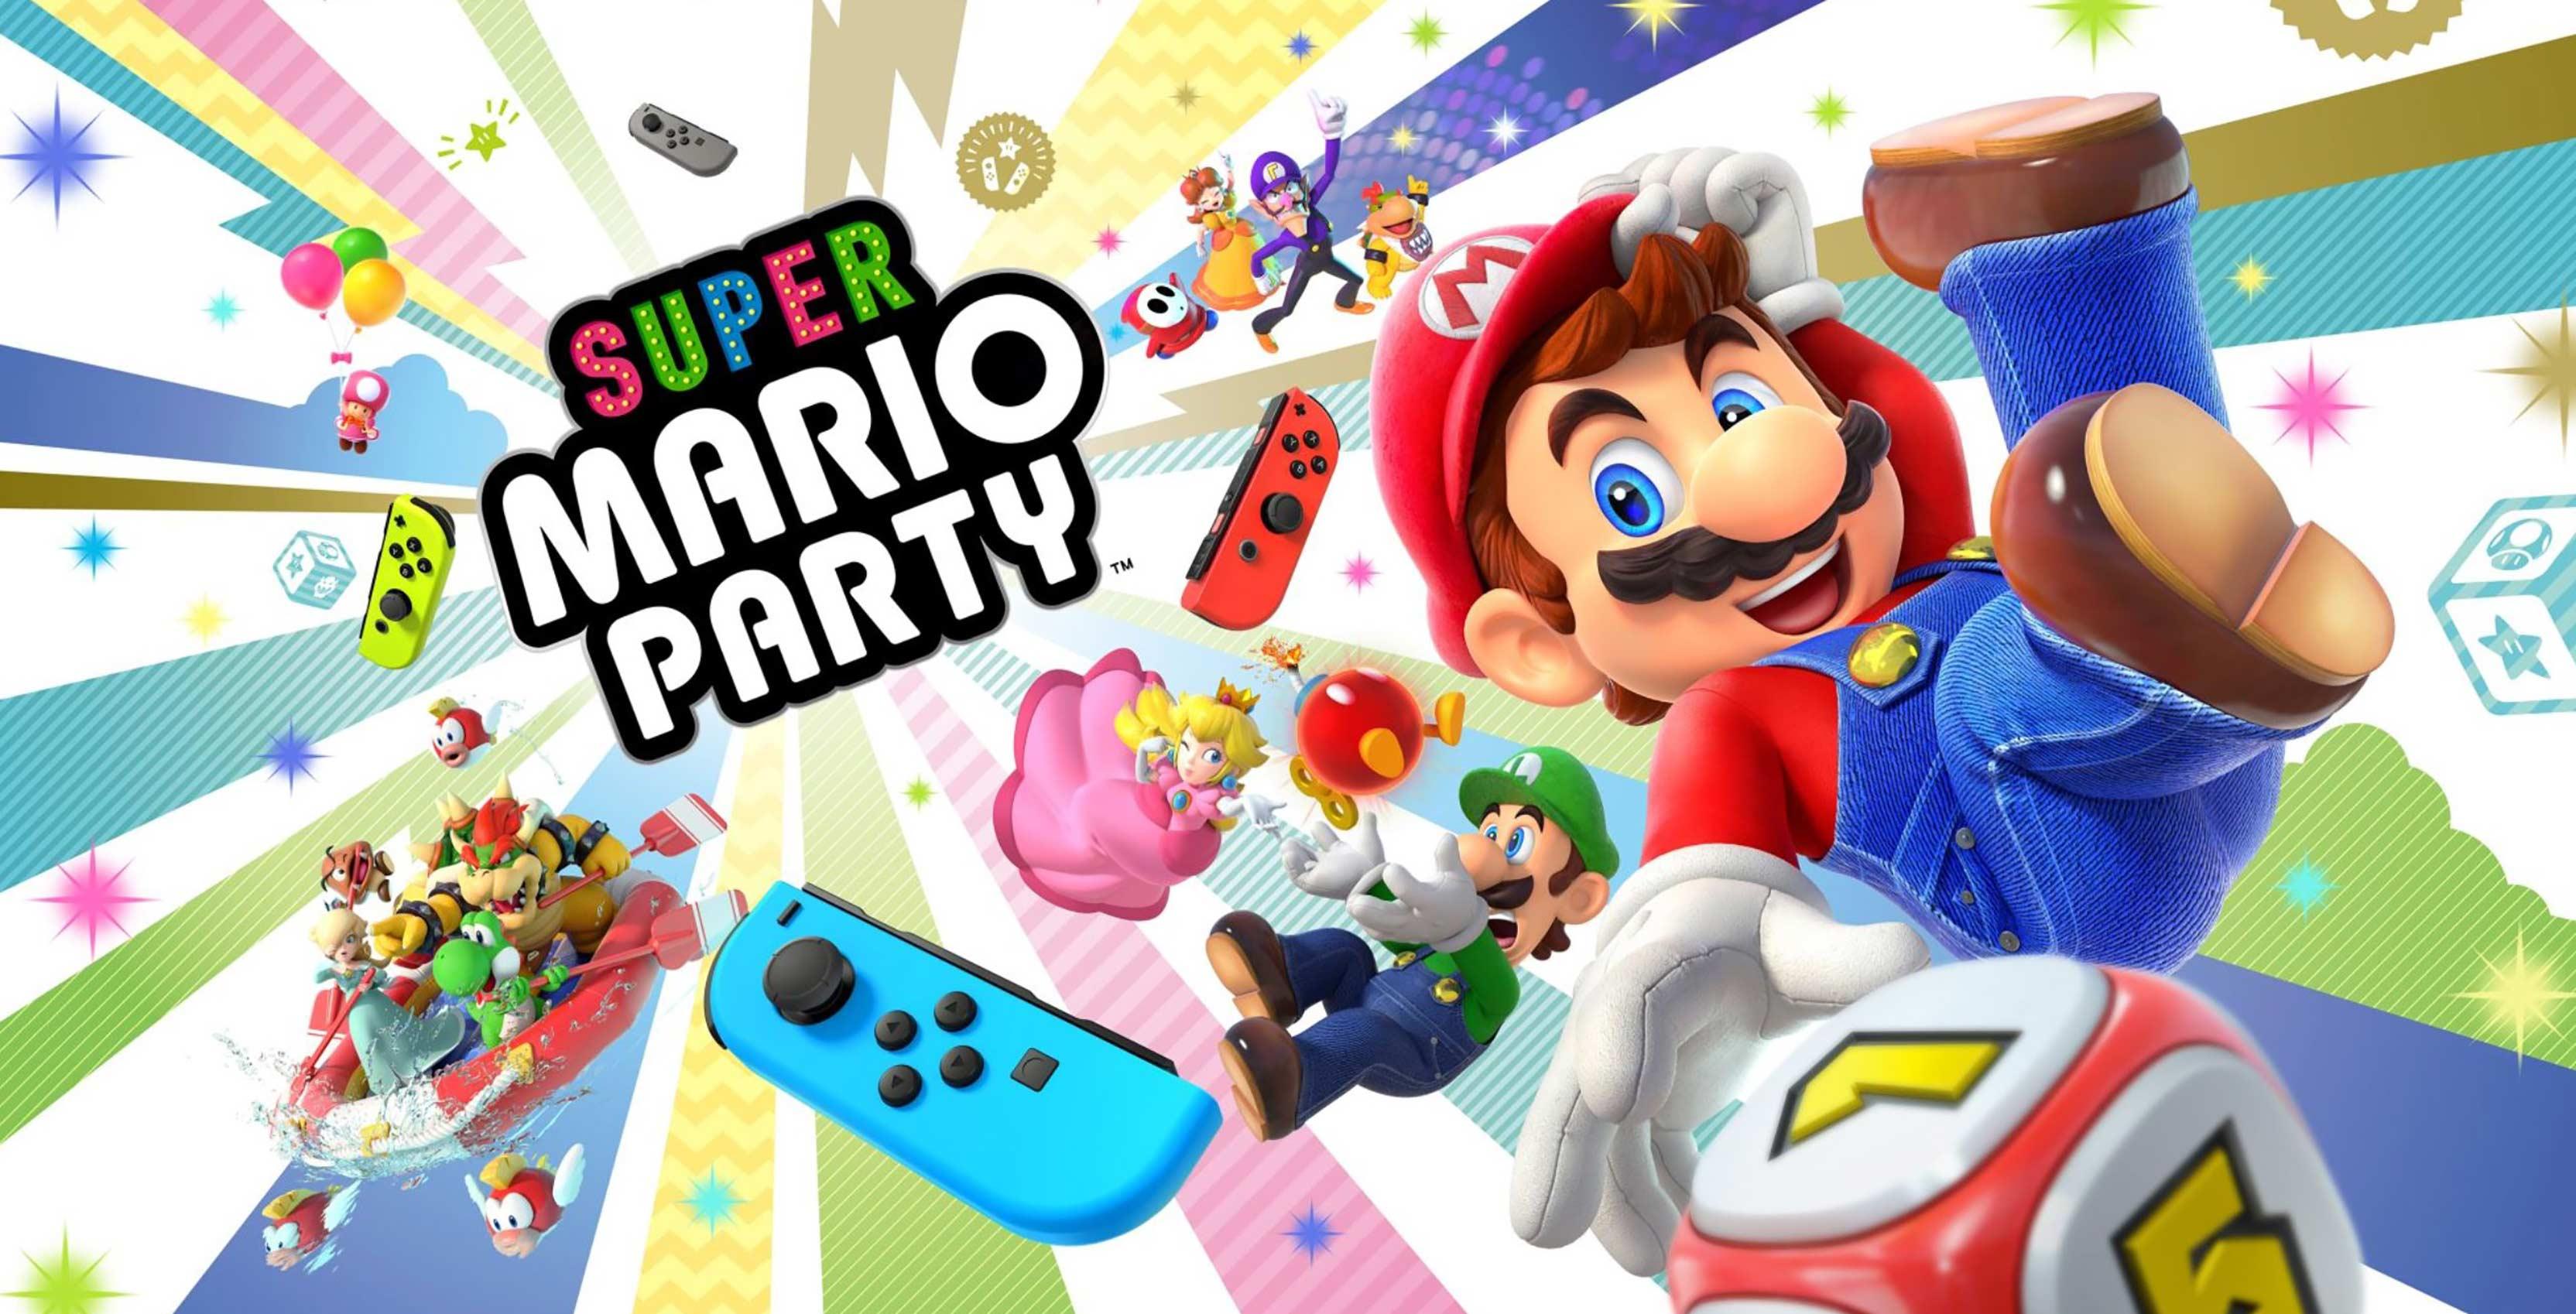 Nintendo Shows Off Super Mario Party And Smash Bros Ultimate